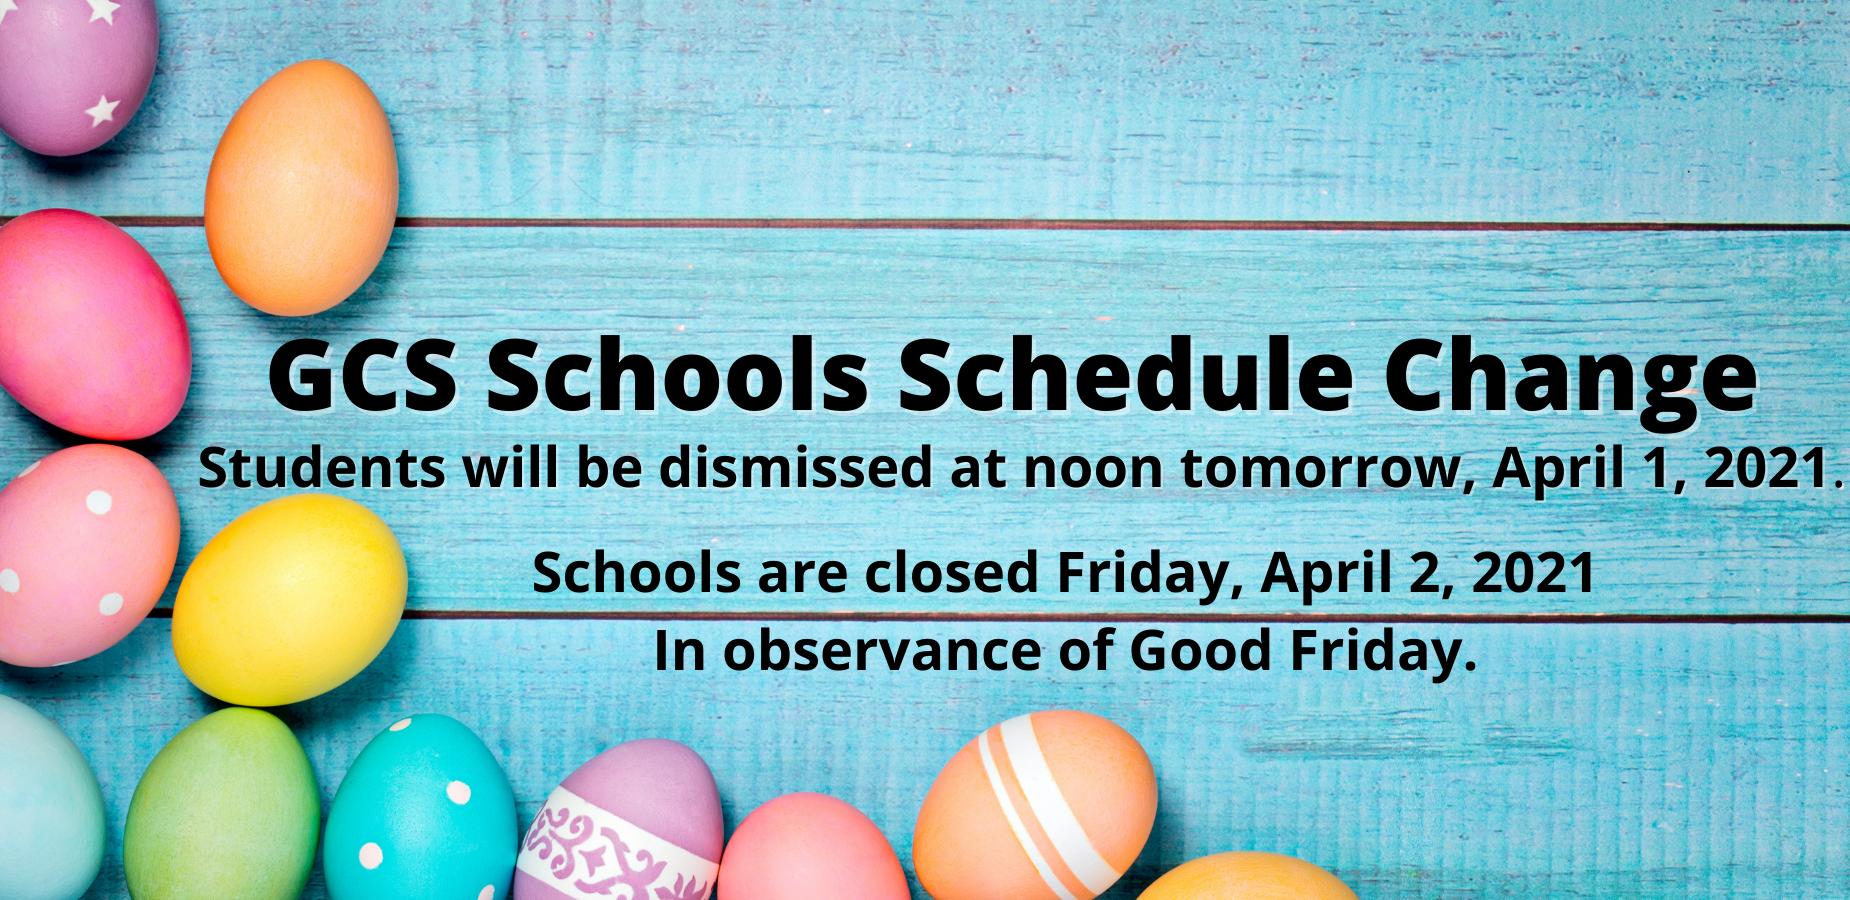 GCS half-day 4/1/21 and GCS closed 4/2/21